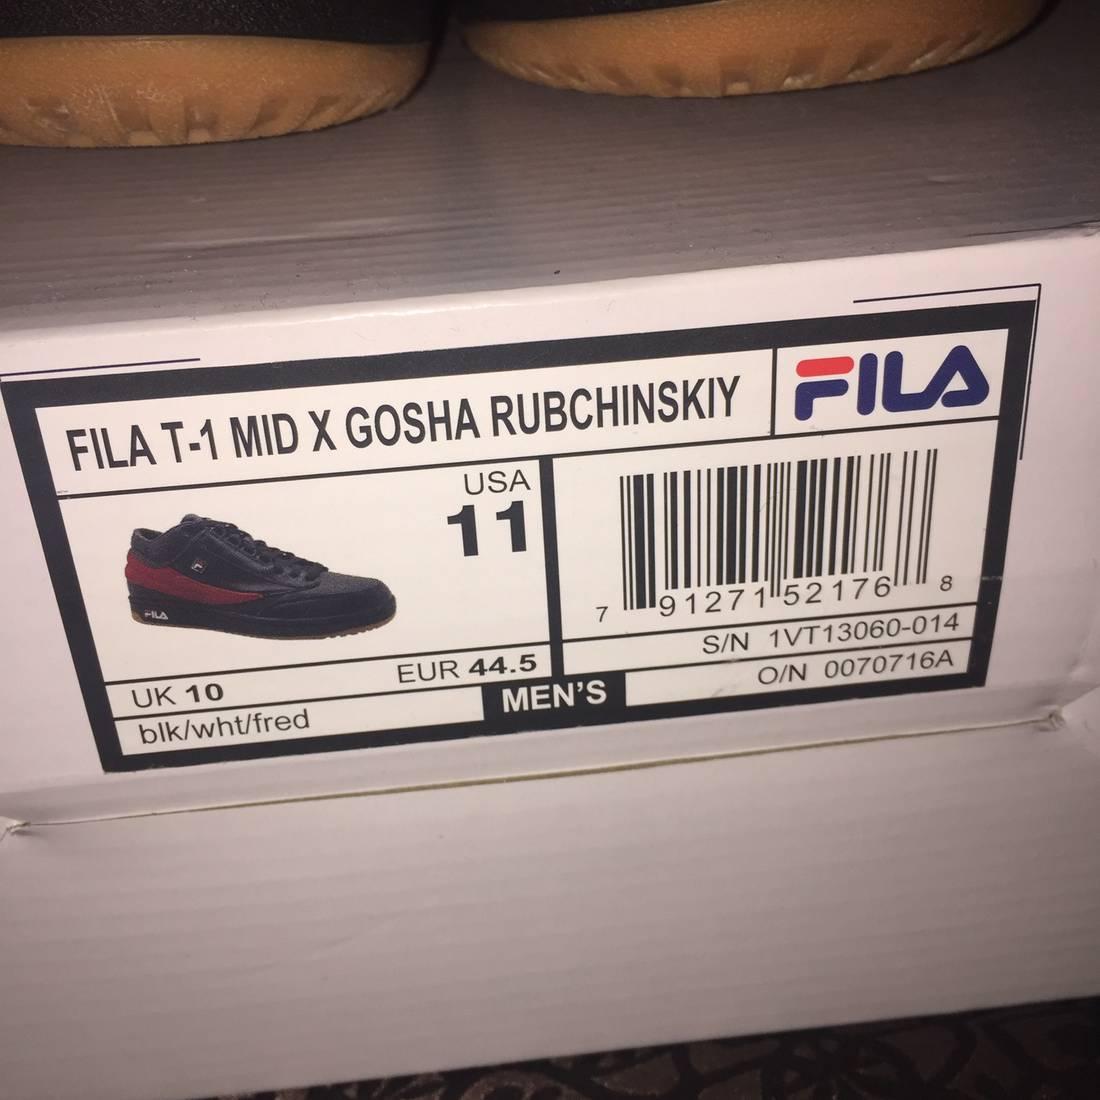 cozy fresh 36637 4cdc1 gosha rubchinskiy x fila t 1 mid sneakers 1vt13060  110 f46b6c73c0